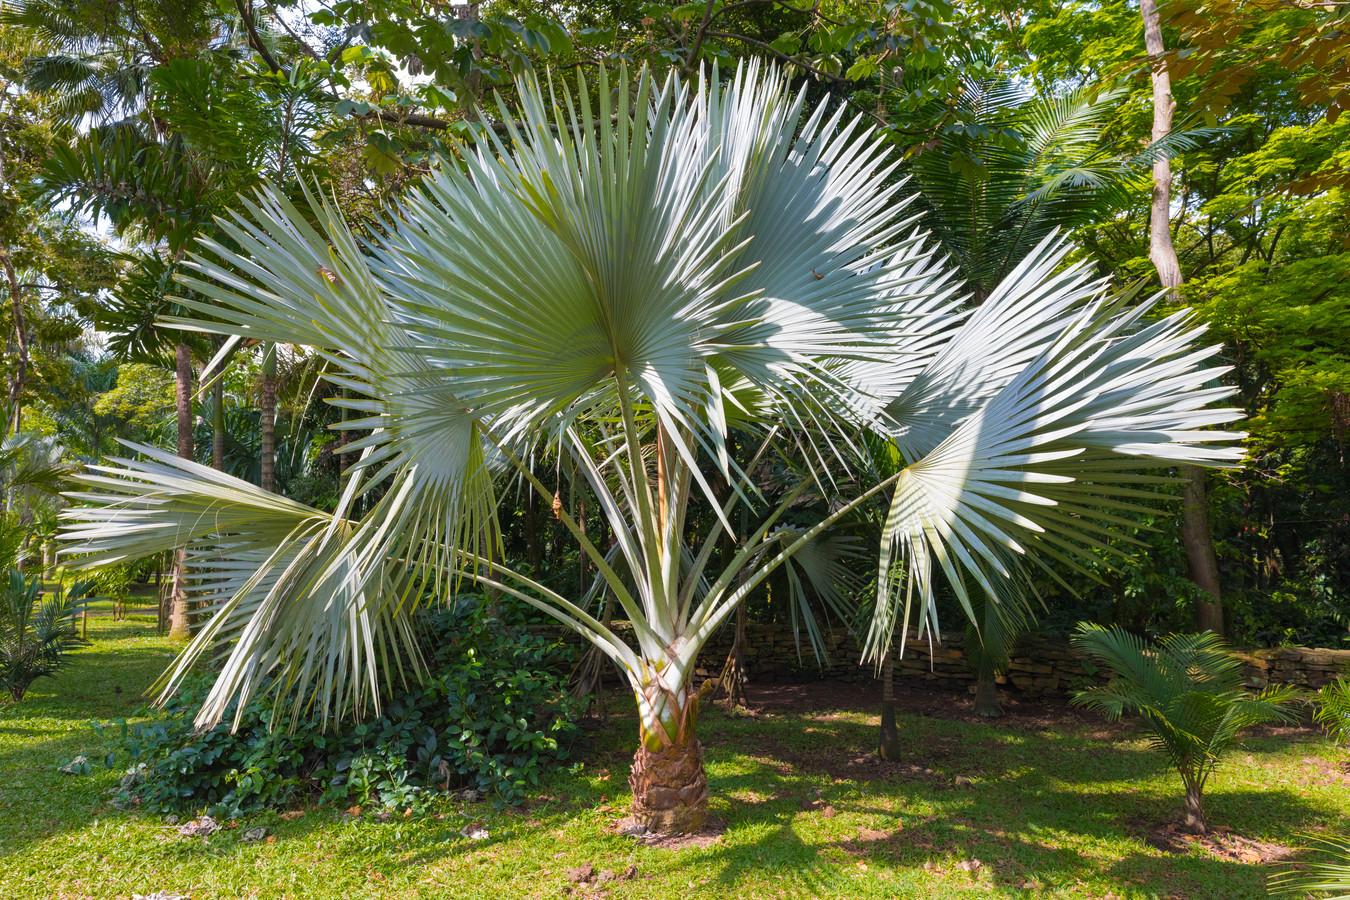 De Trachycarpus fortunei is het populairst in Nederland.